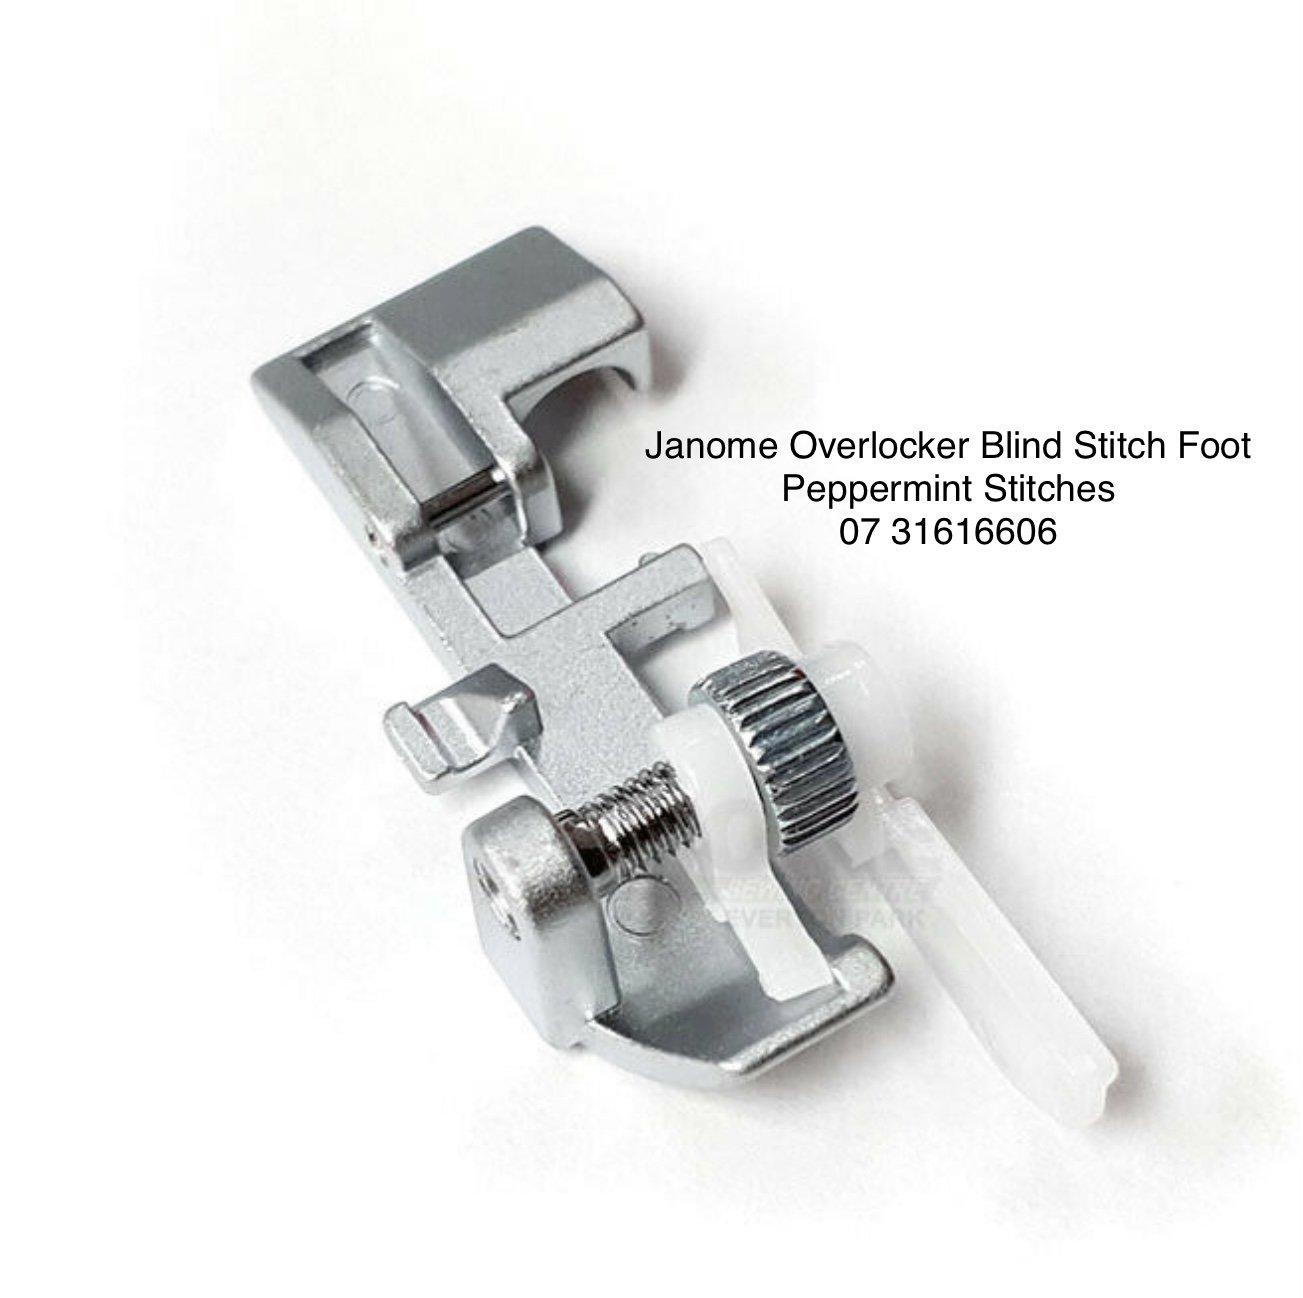 Janome Overlocker/Serger Blind Stitch Foot compatible - MyLock, EzyLock